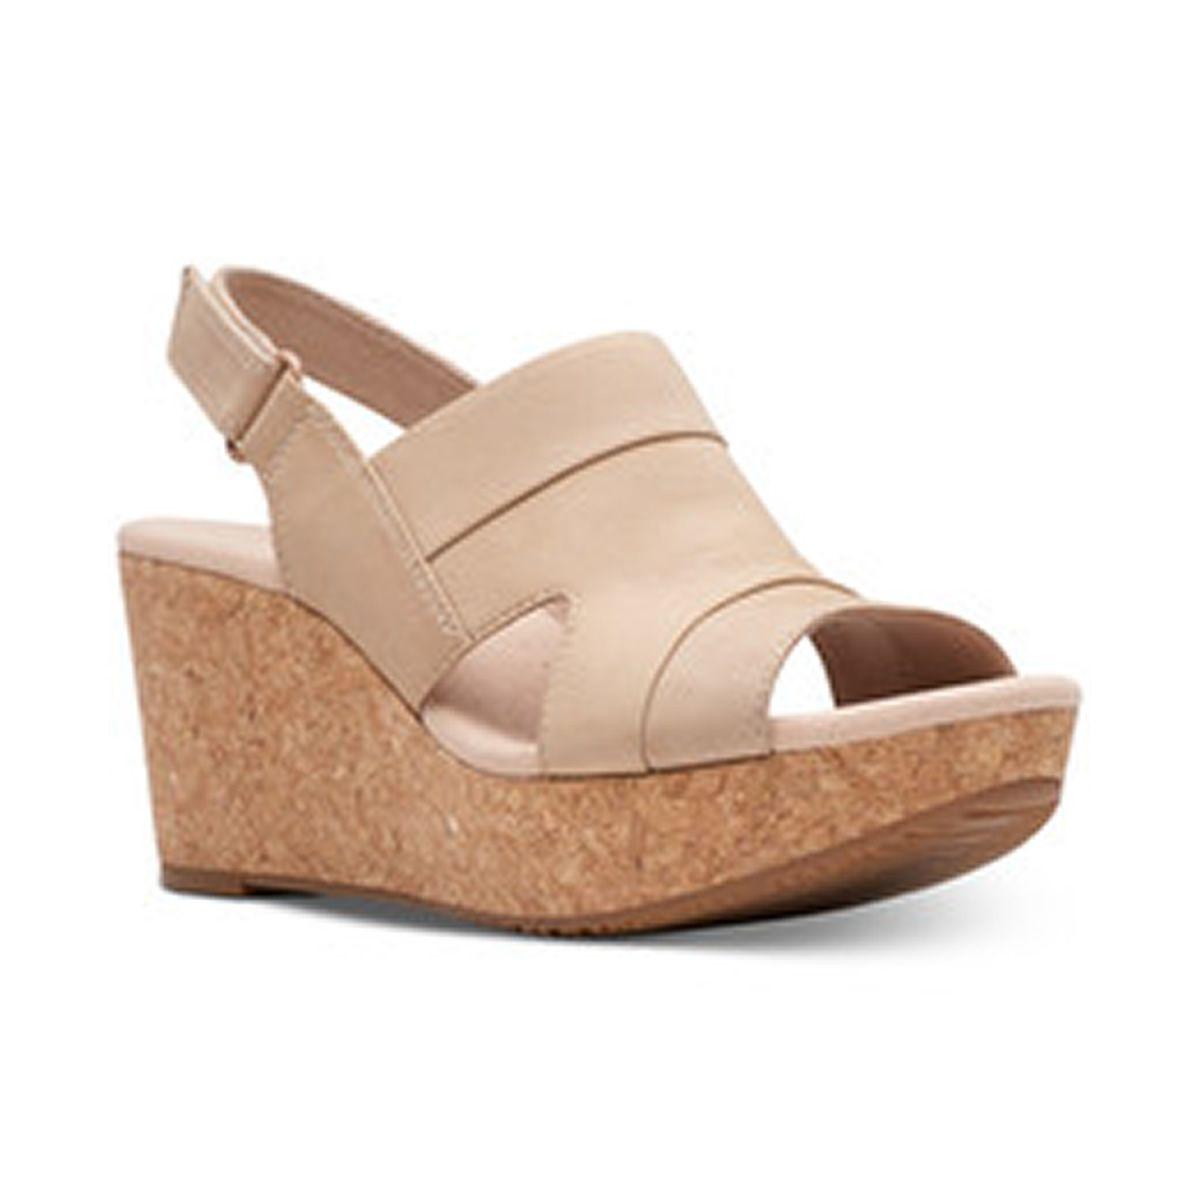 Clarks Shoes for Women - Macy s 899fecd3468eb